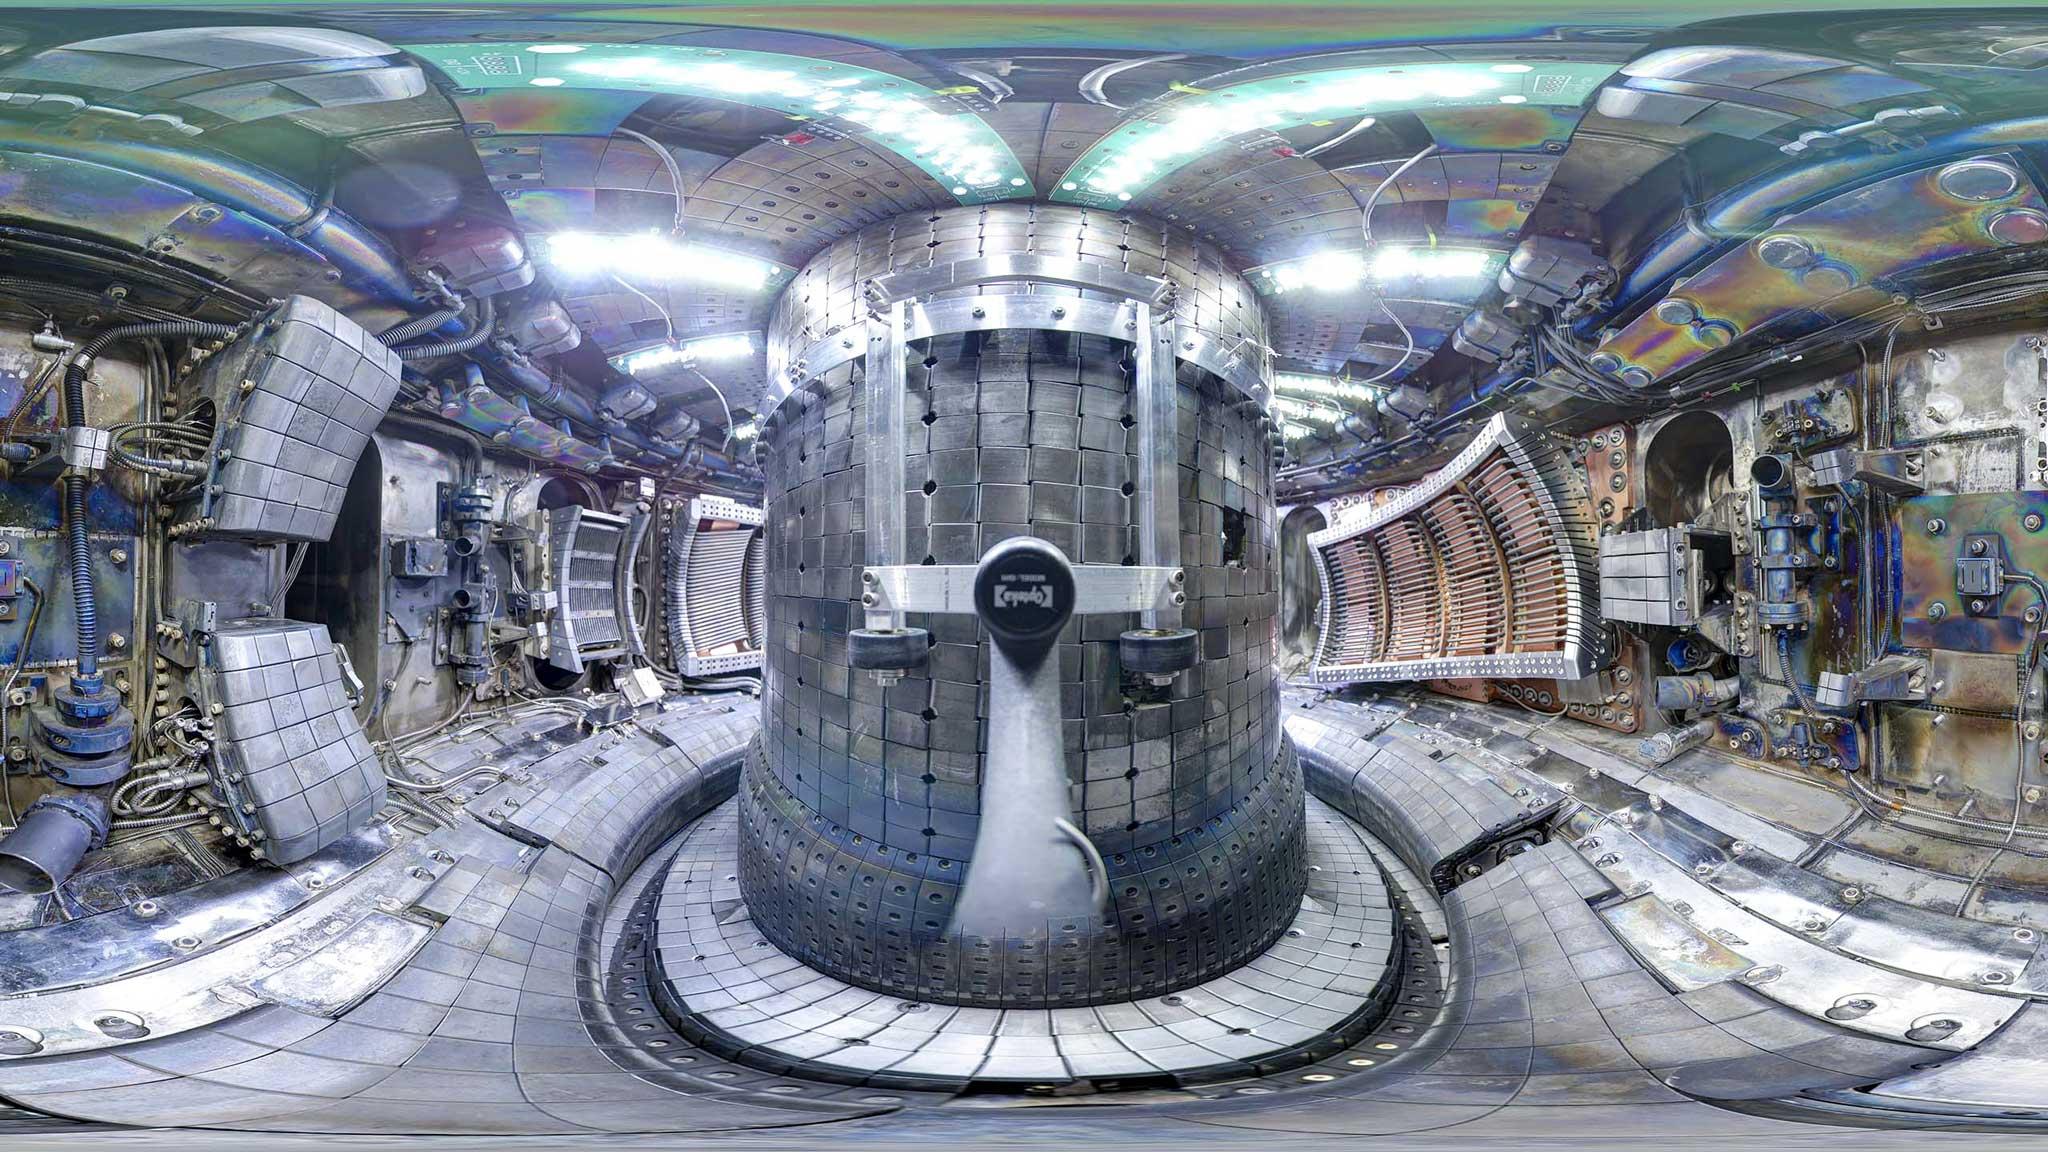 fusion reactor breaks record shut down nova pbs nova pbs